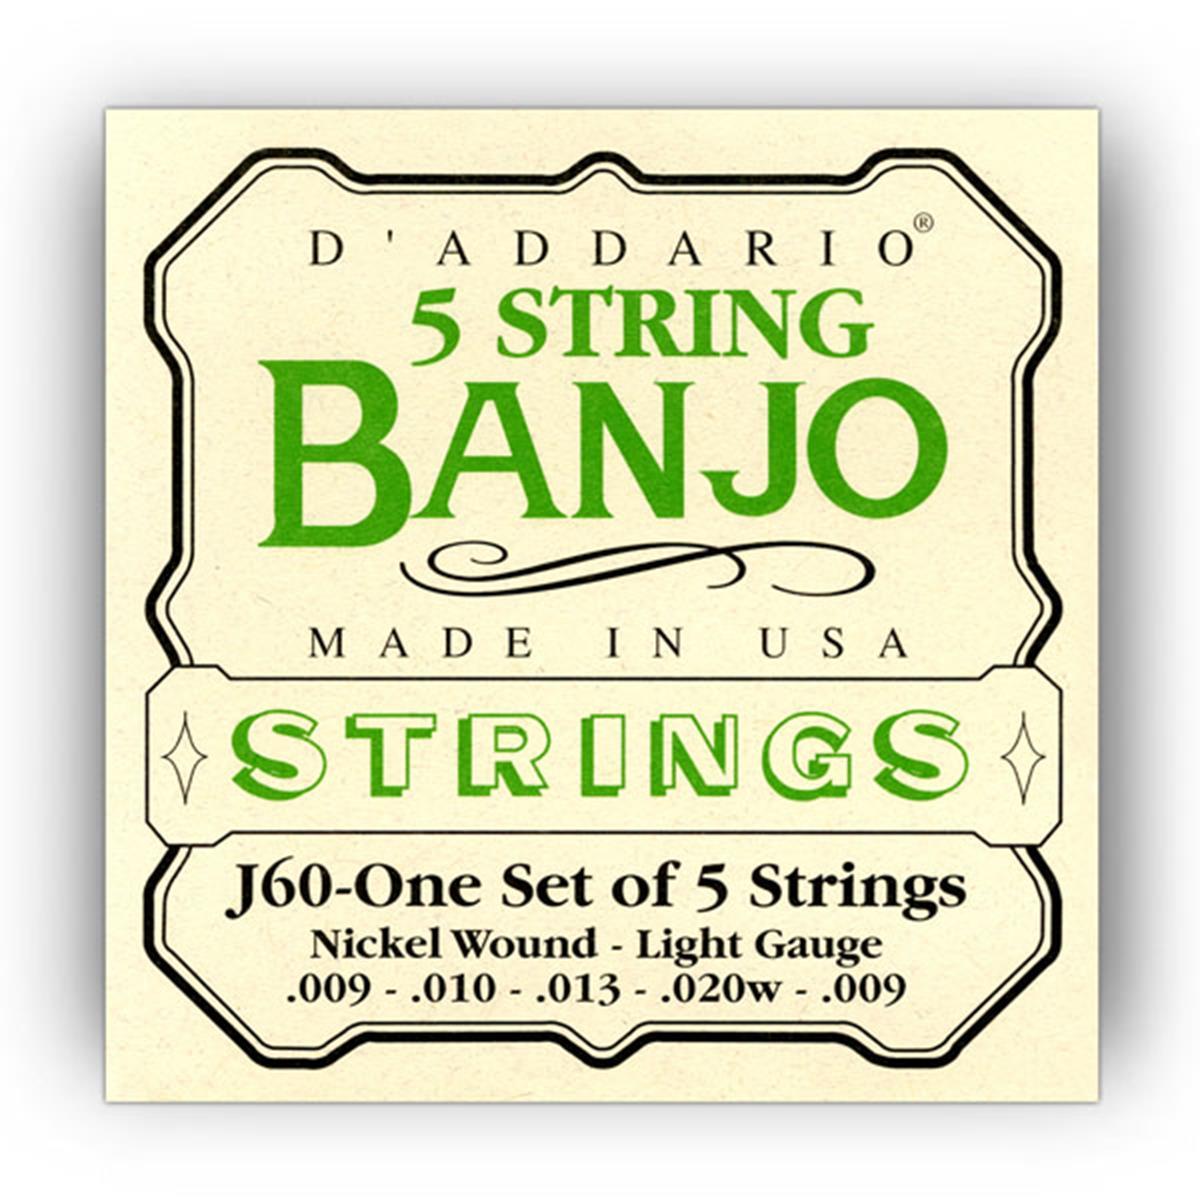 D'ADDARIO J60 5 STRING BANJO MUTA - Strumenti A Corda Strumenti a Corda - Corde e Accessori